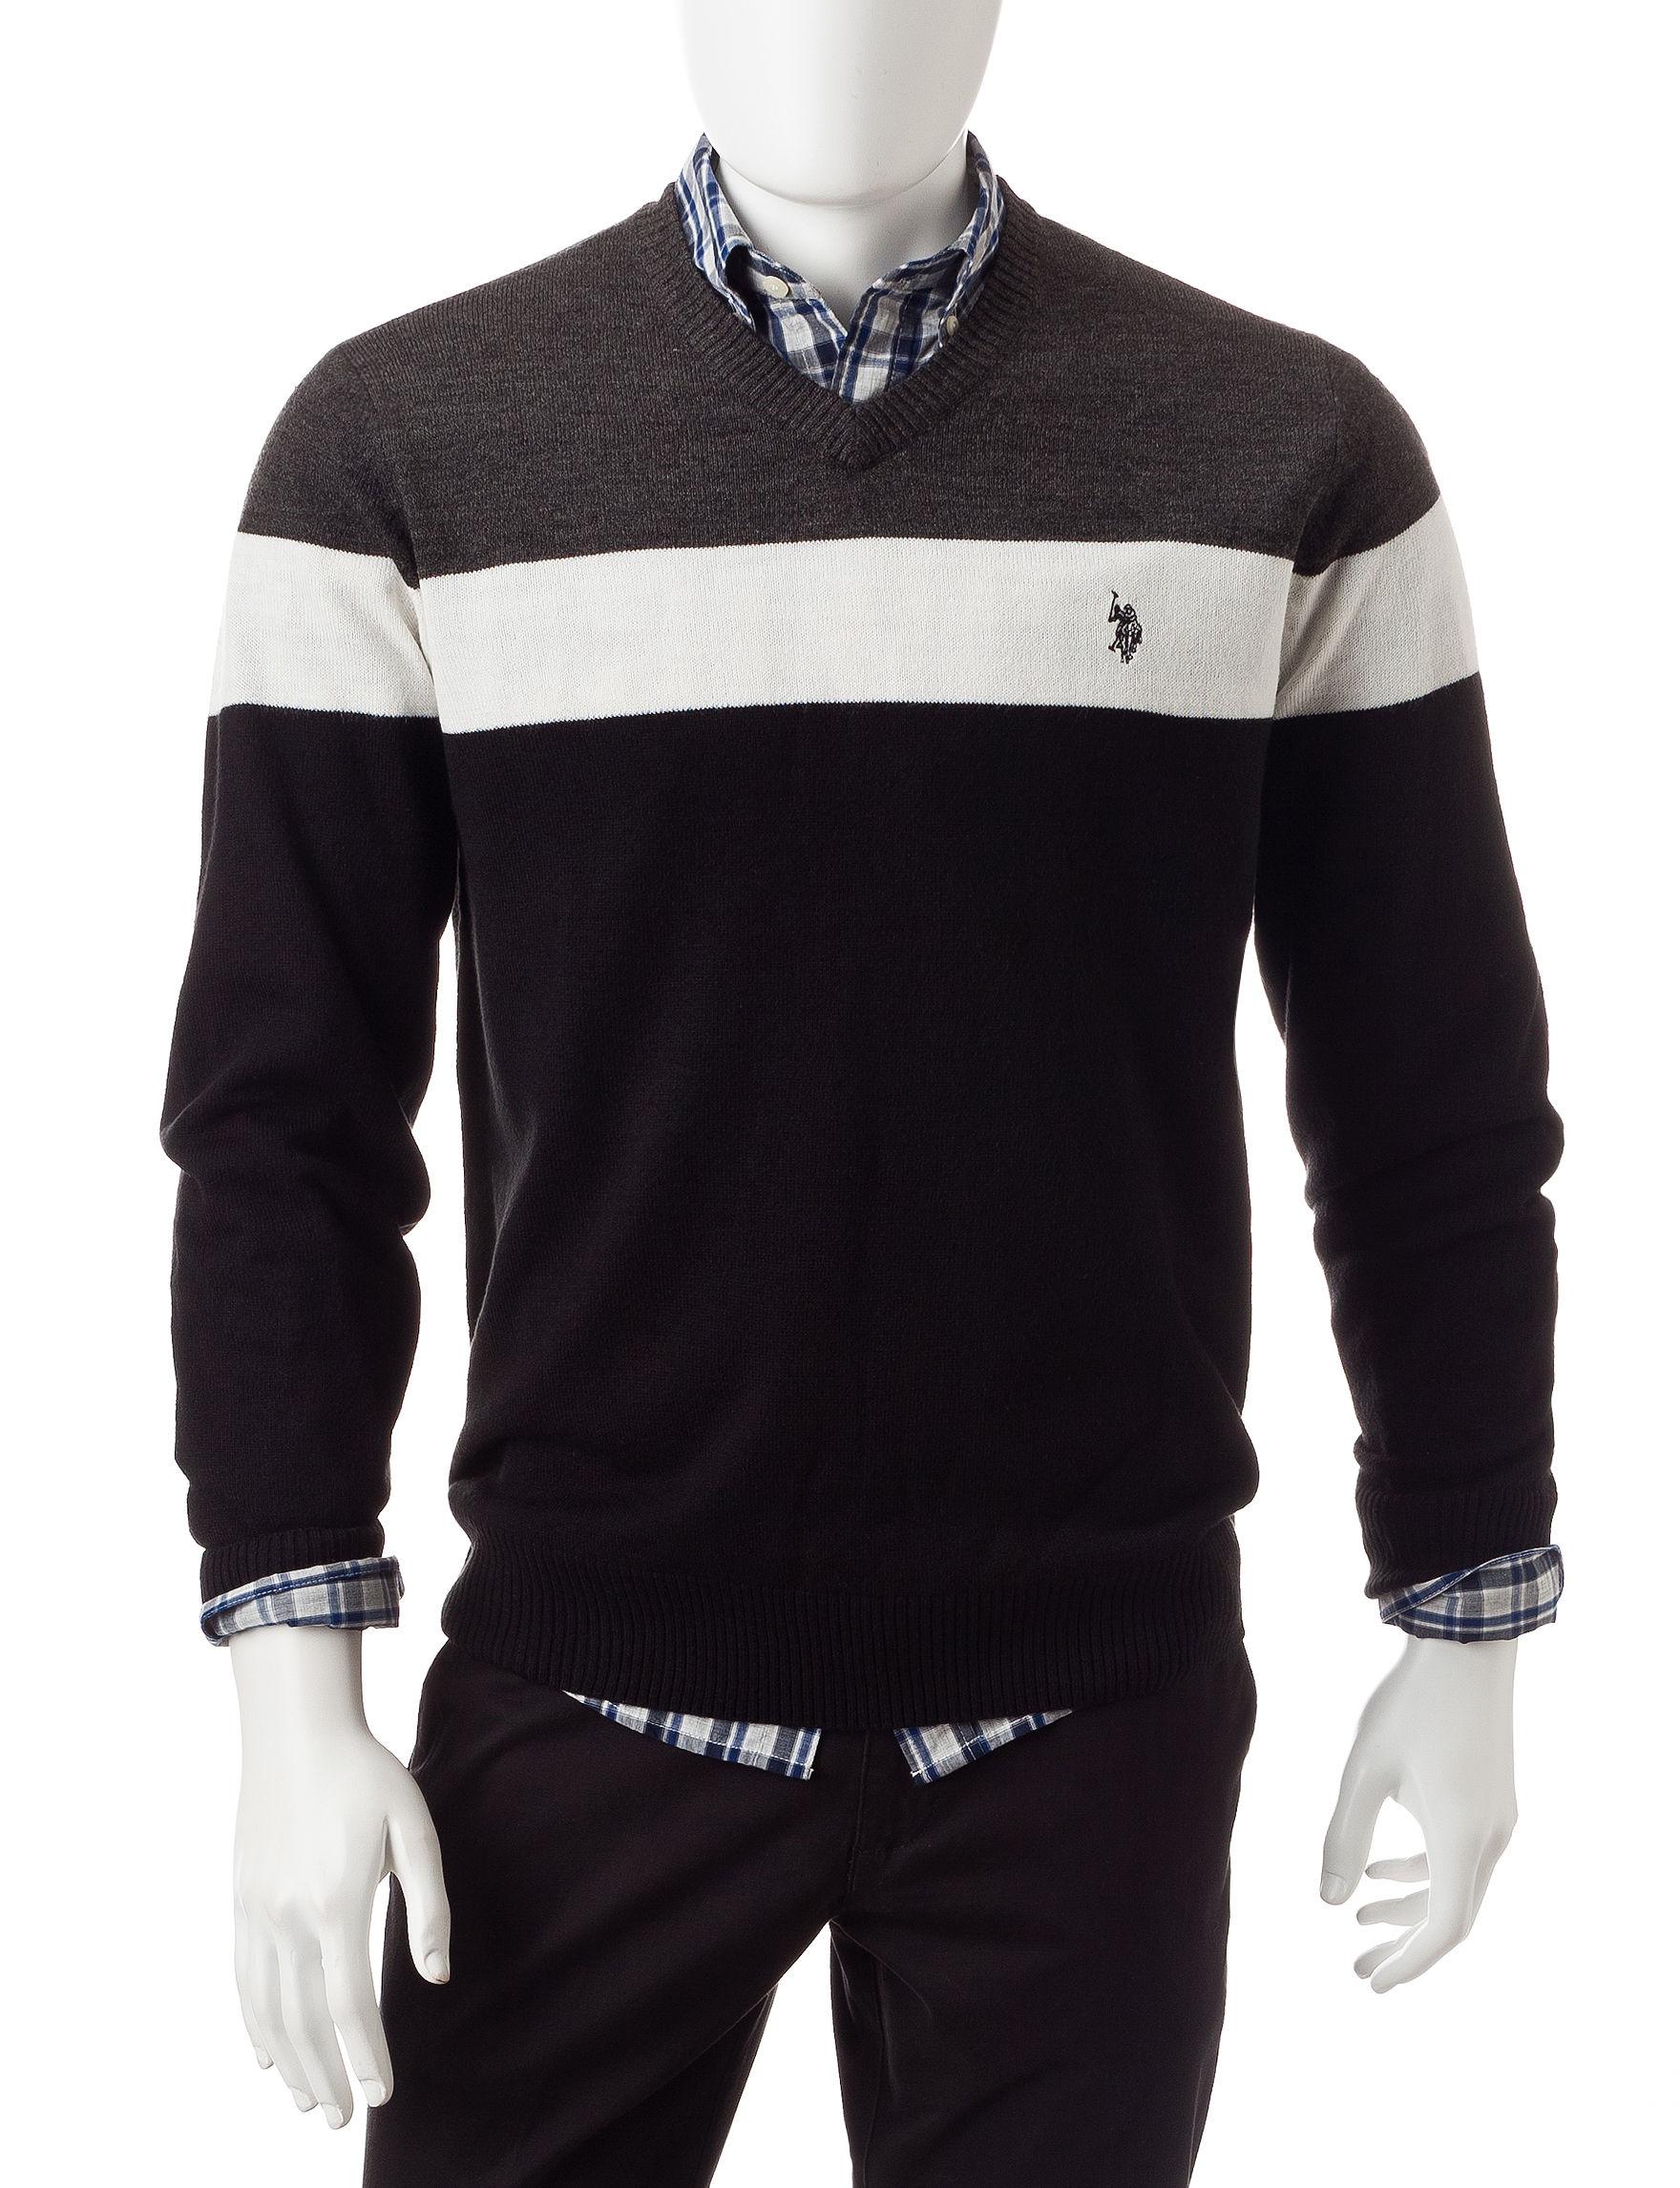 U.S. Polo Assn. Black Sweaters